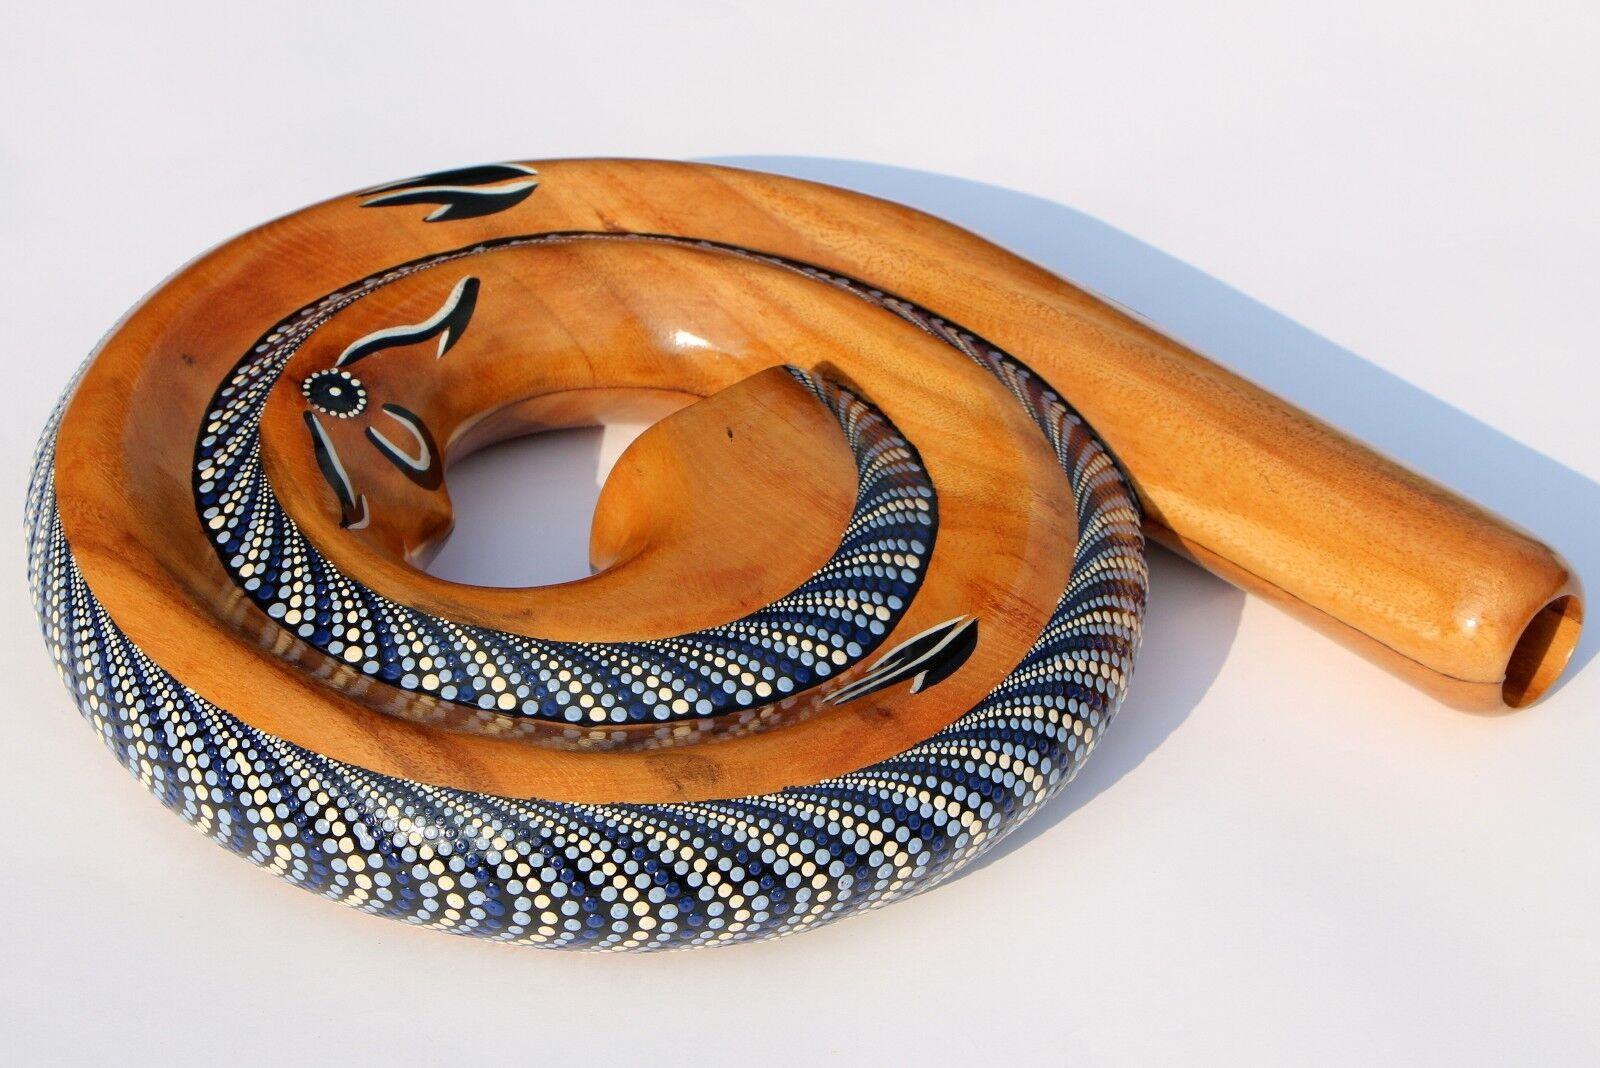 Spiral Reise Didgeridoo Horn Travel Didge 09